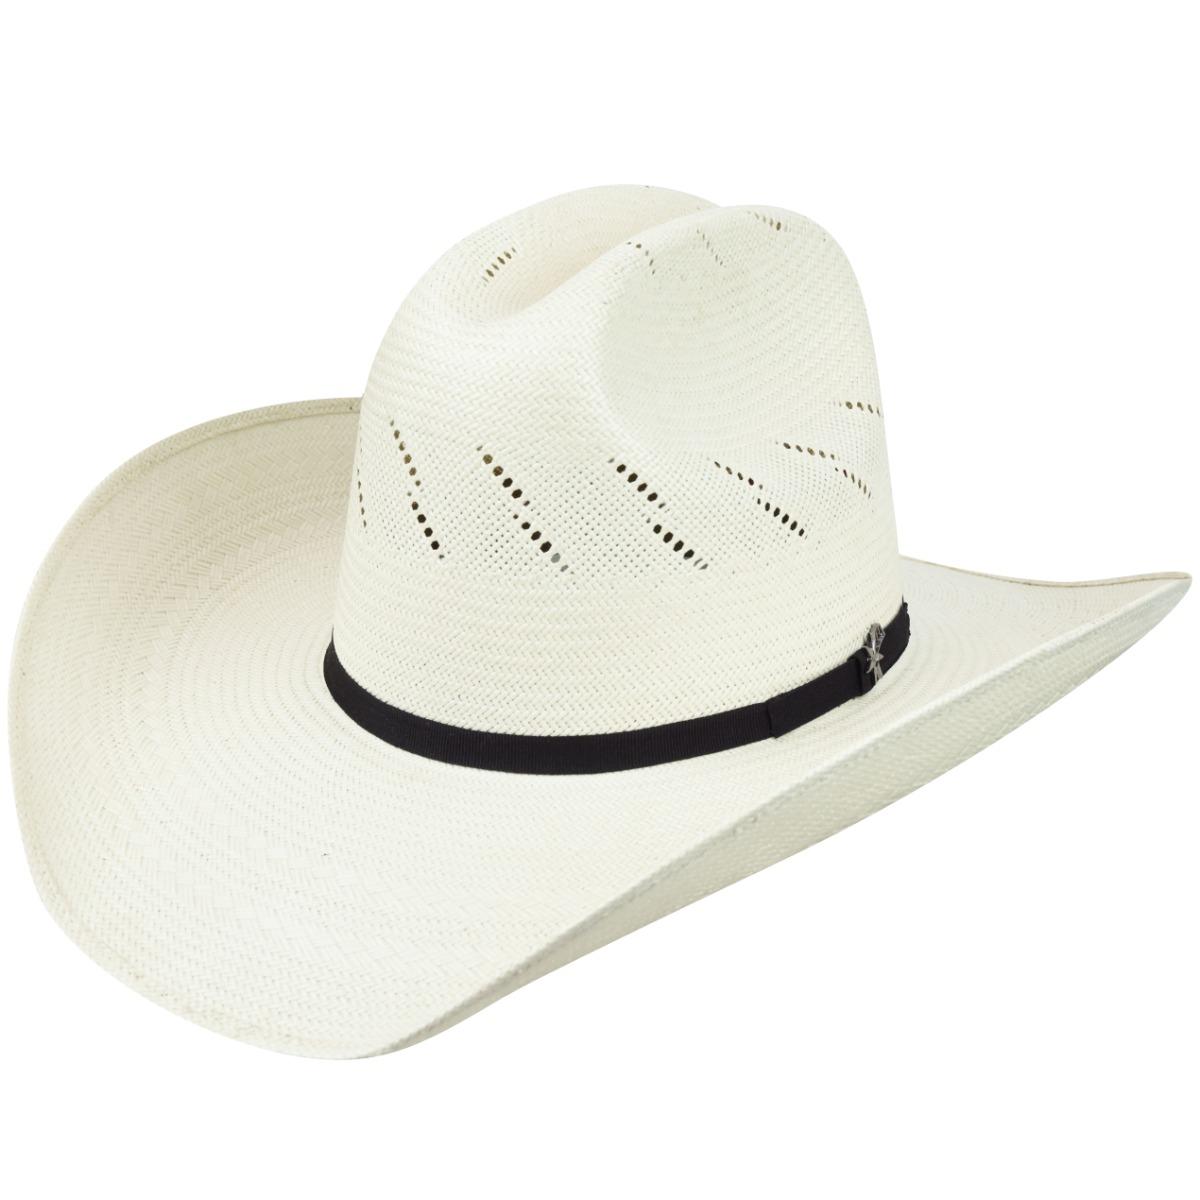 Deuce 20X Western Hat - Natural/7